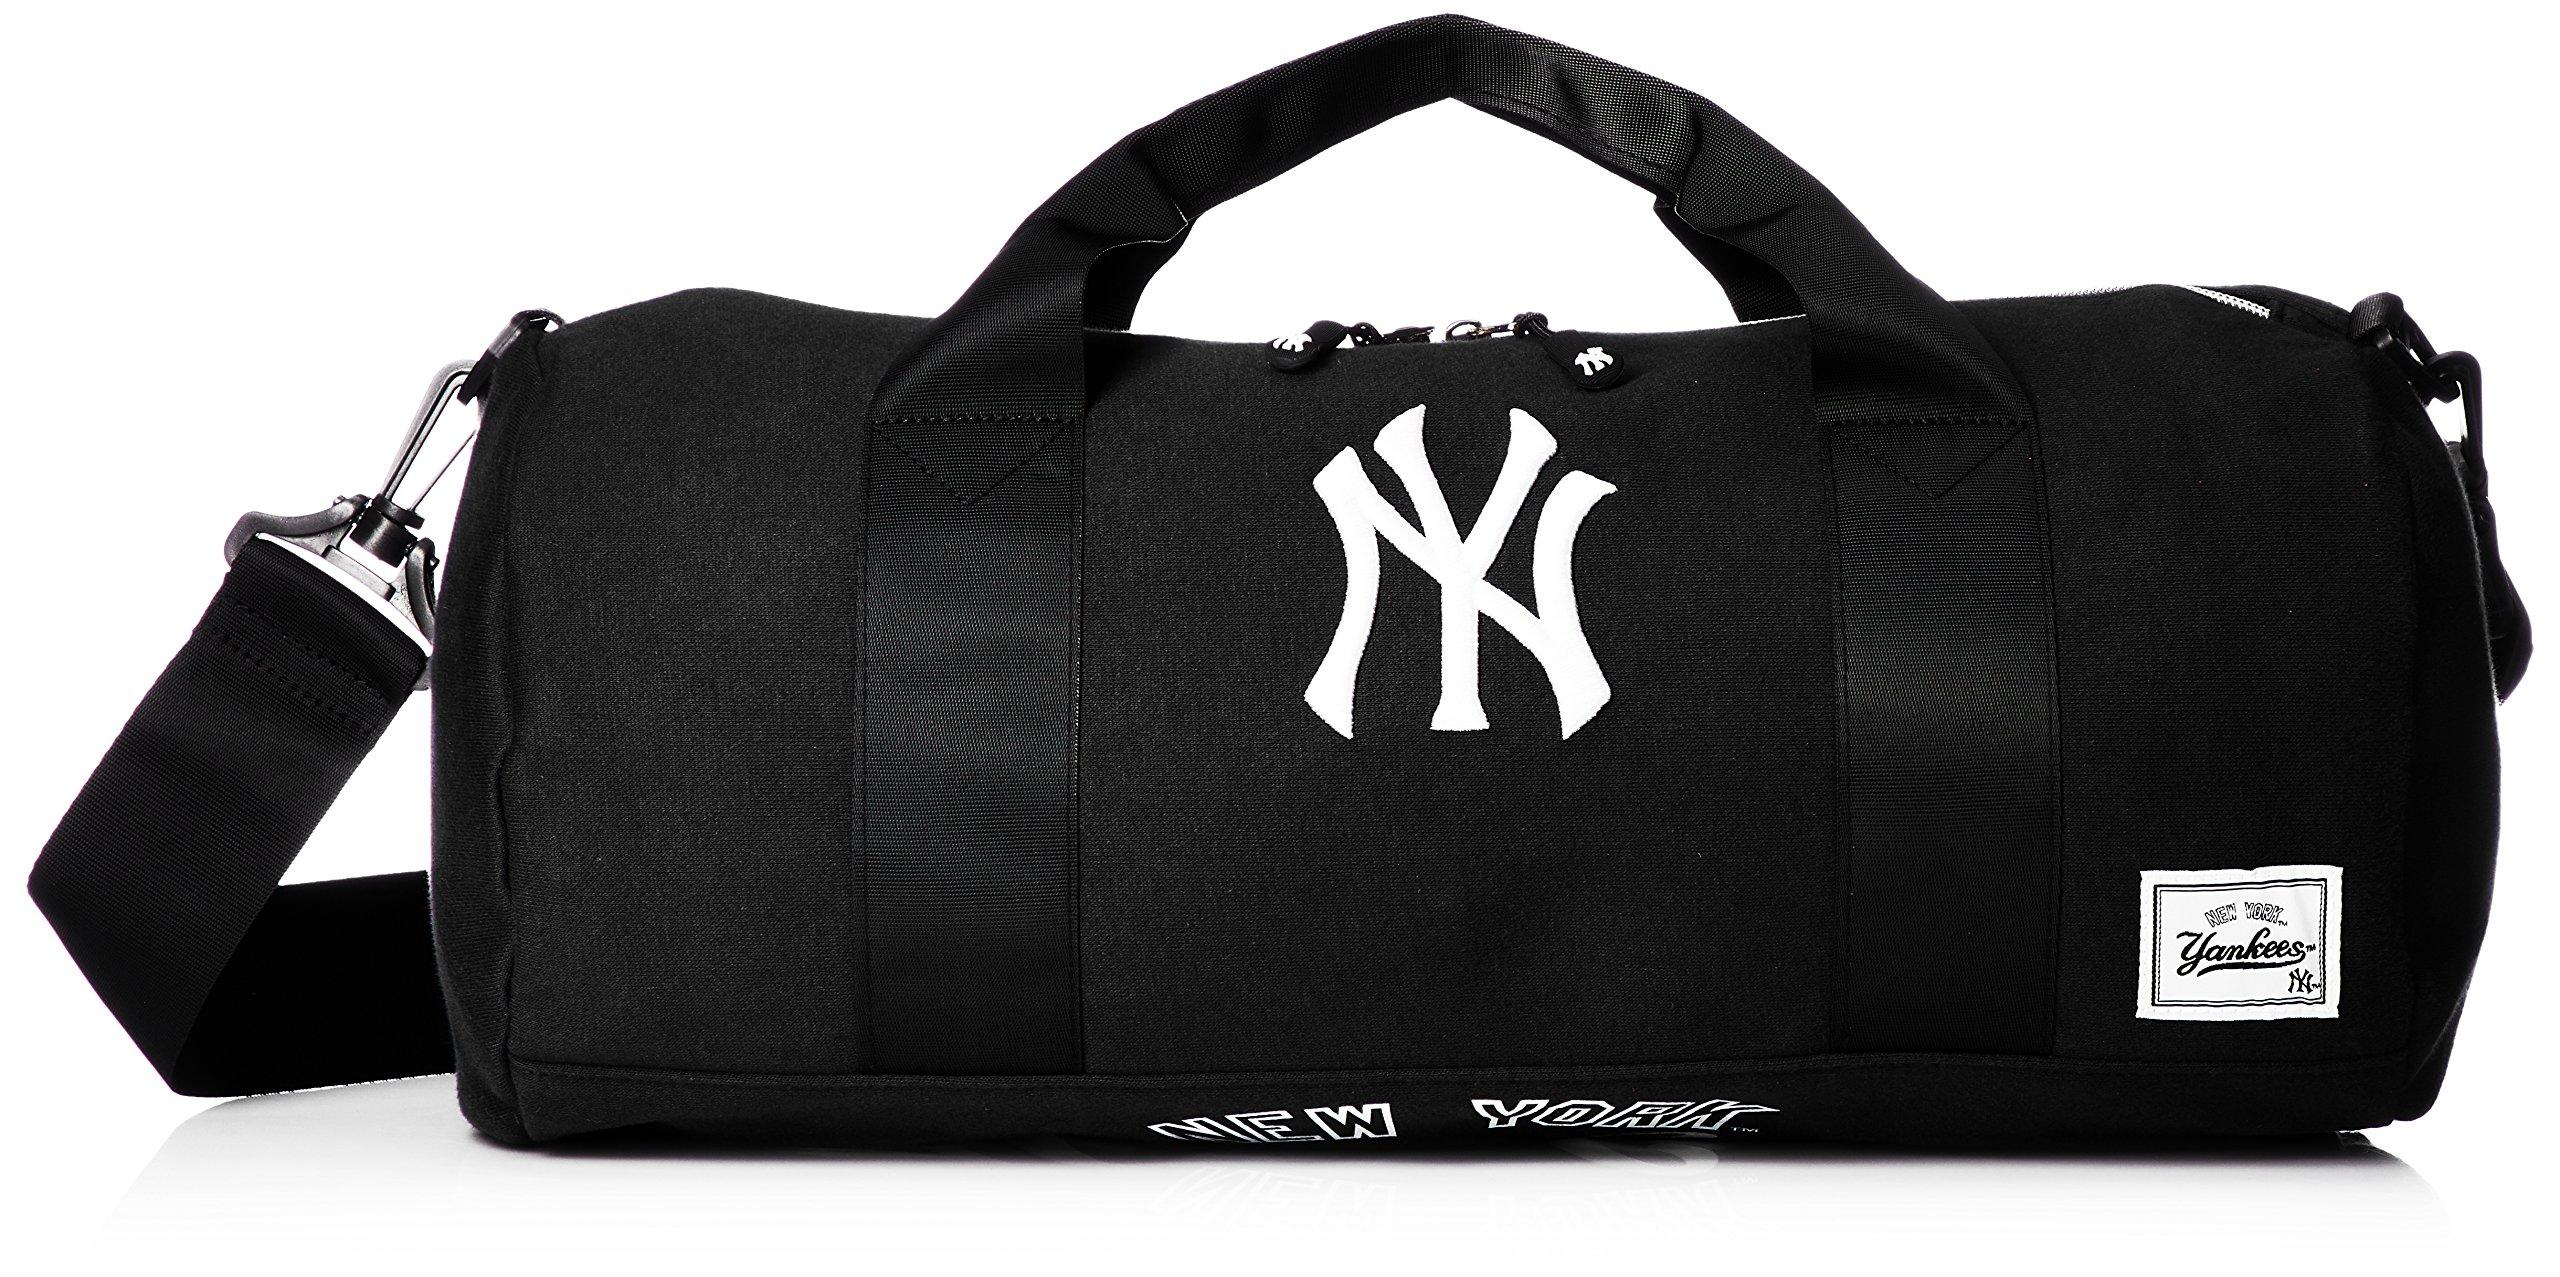 [MLB]旅行2色の6000Dポリエステル旅行/スポーツバッグ - スタジアム65